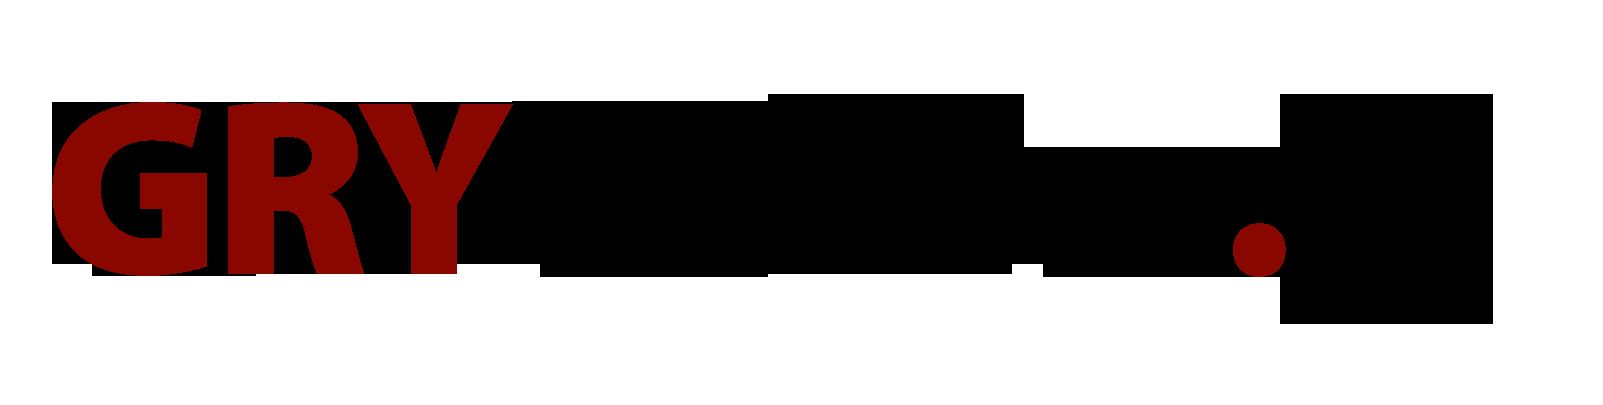 GRY-OnLine, logo